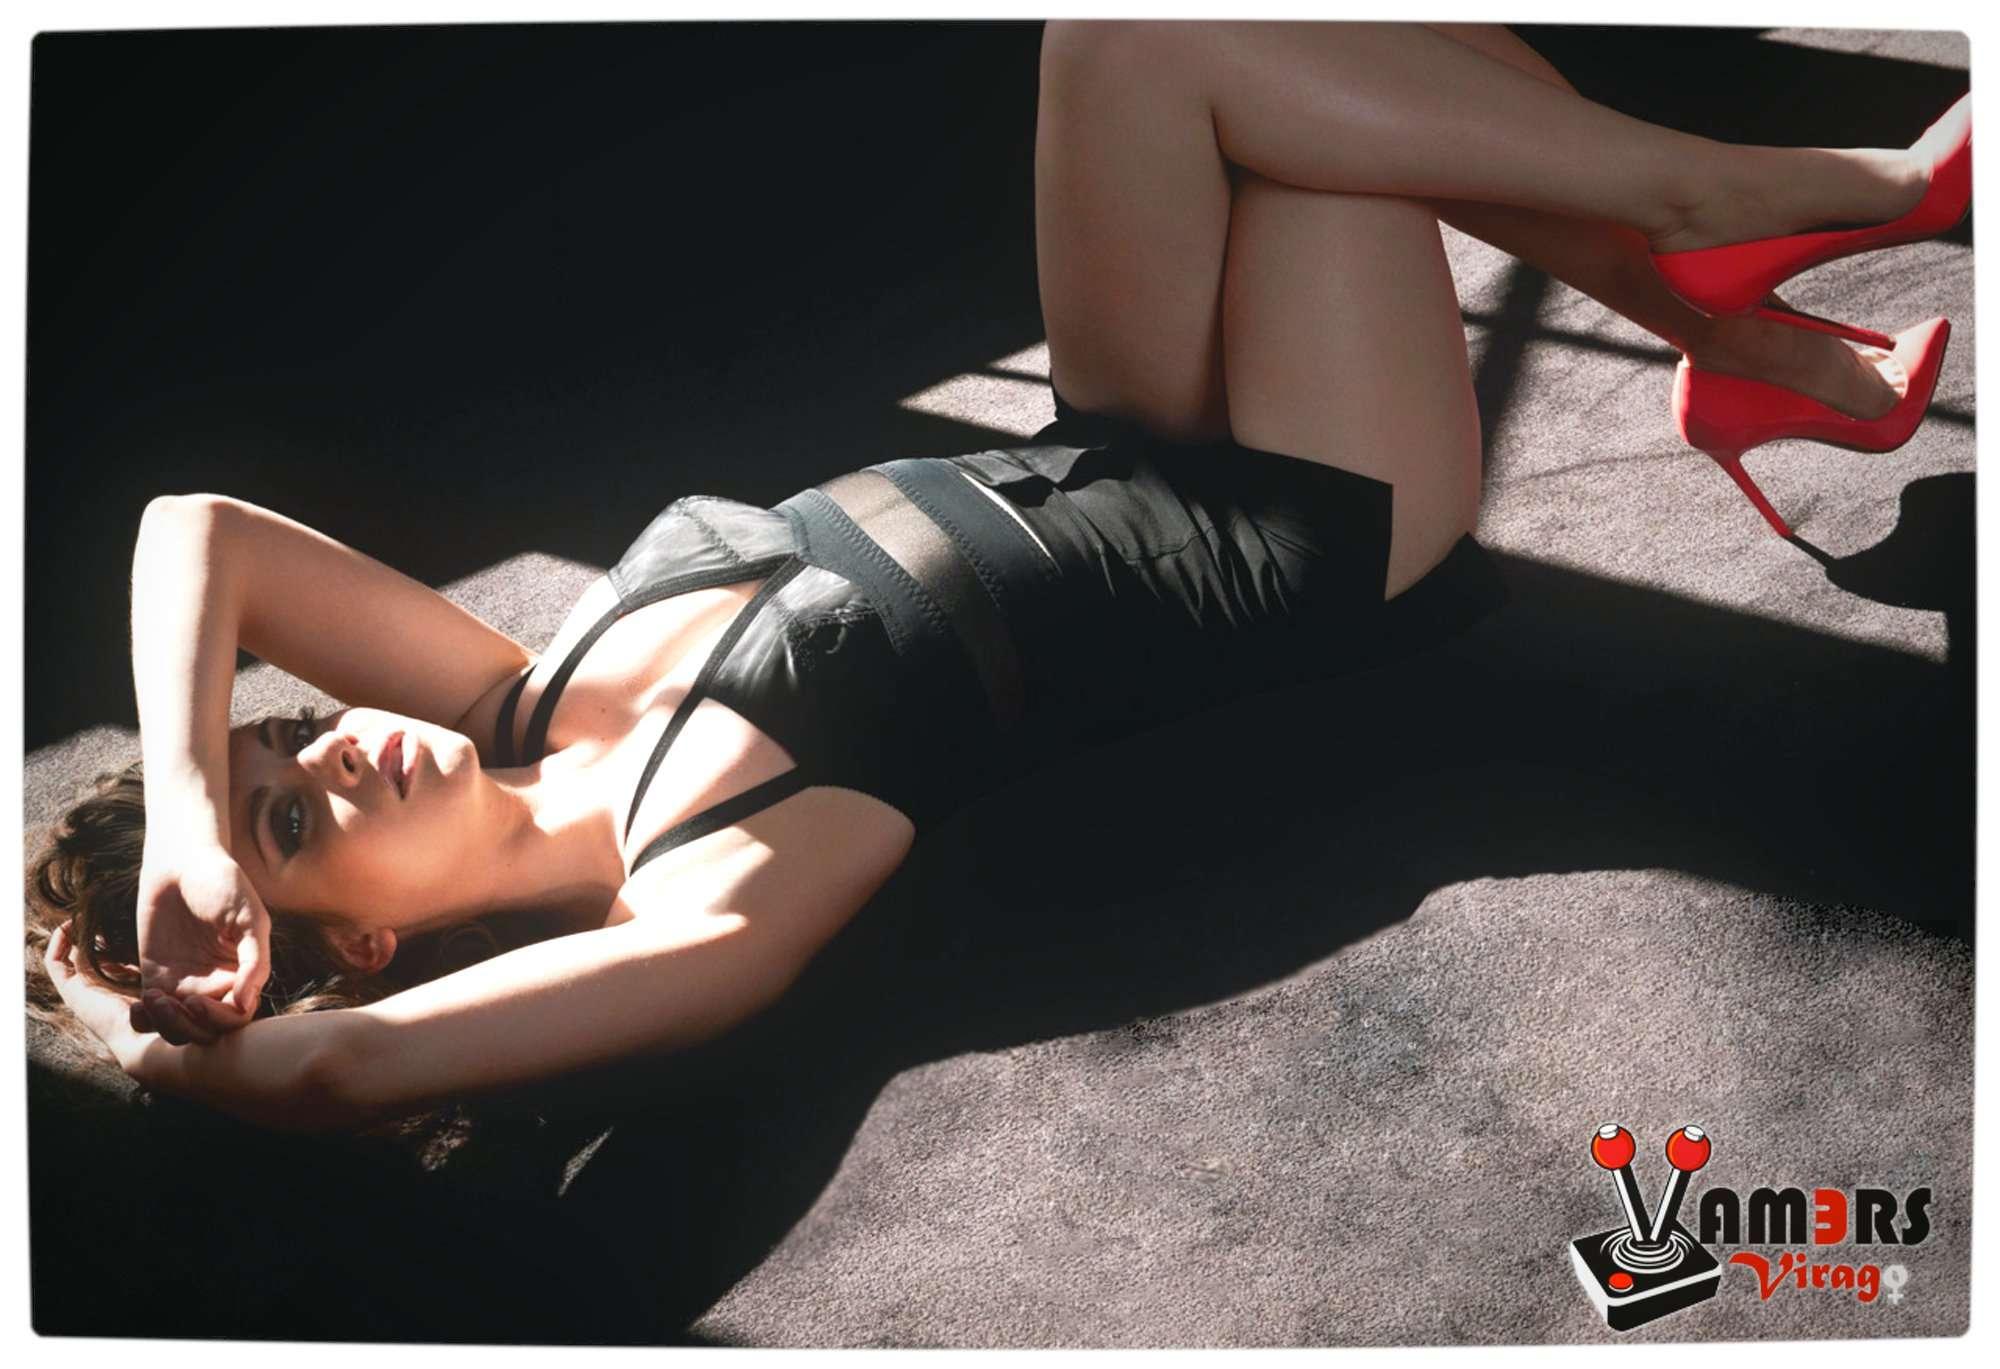 Vamers Virago - 2014 - February - Alison Brie 05